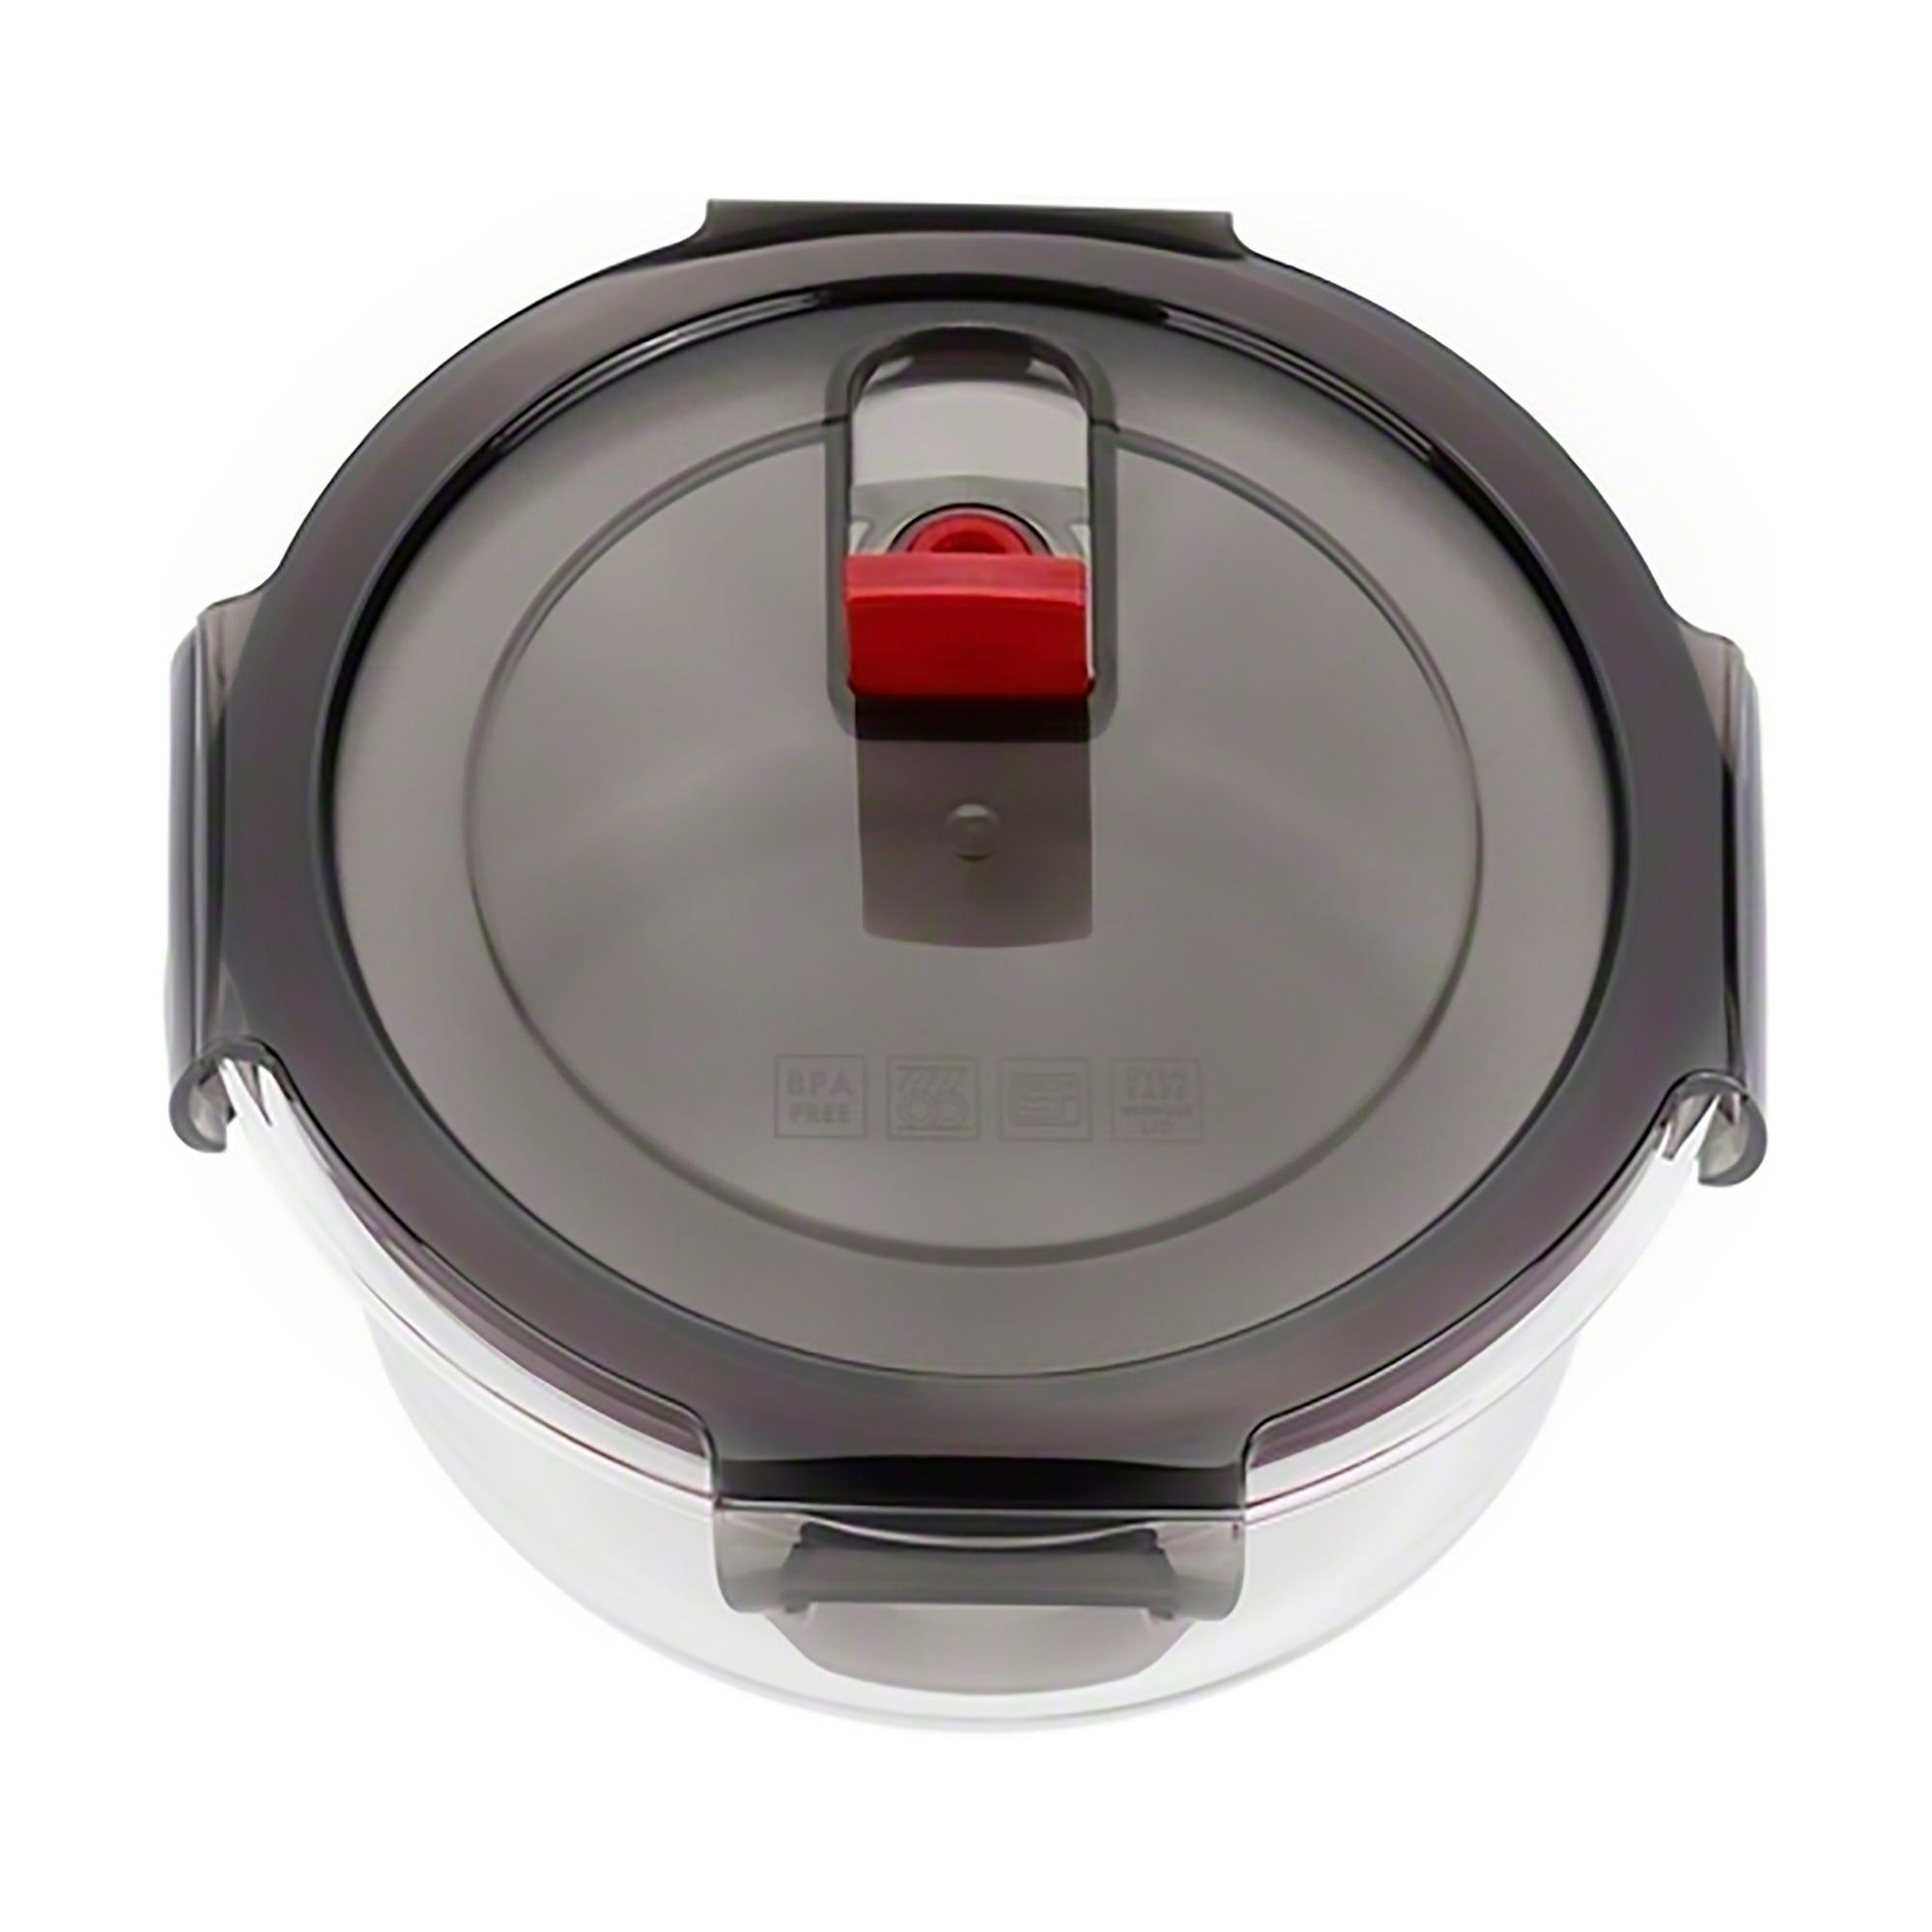 Contenedor de vidrio Zwilling®, redondo de 600 mL